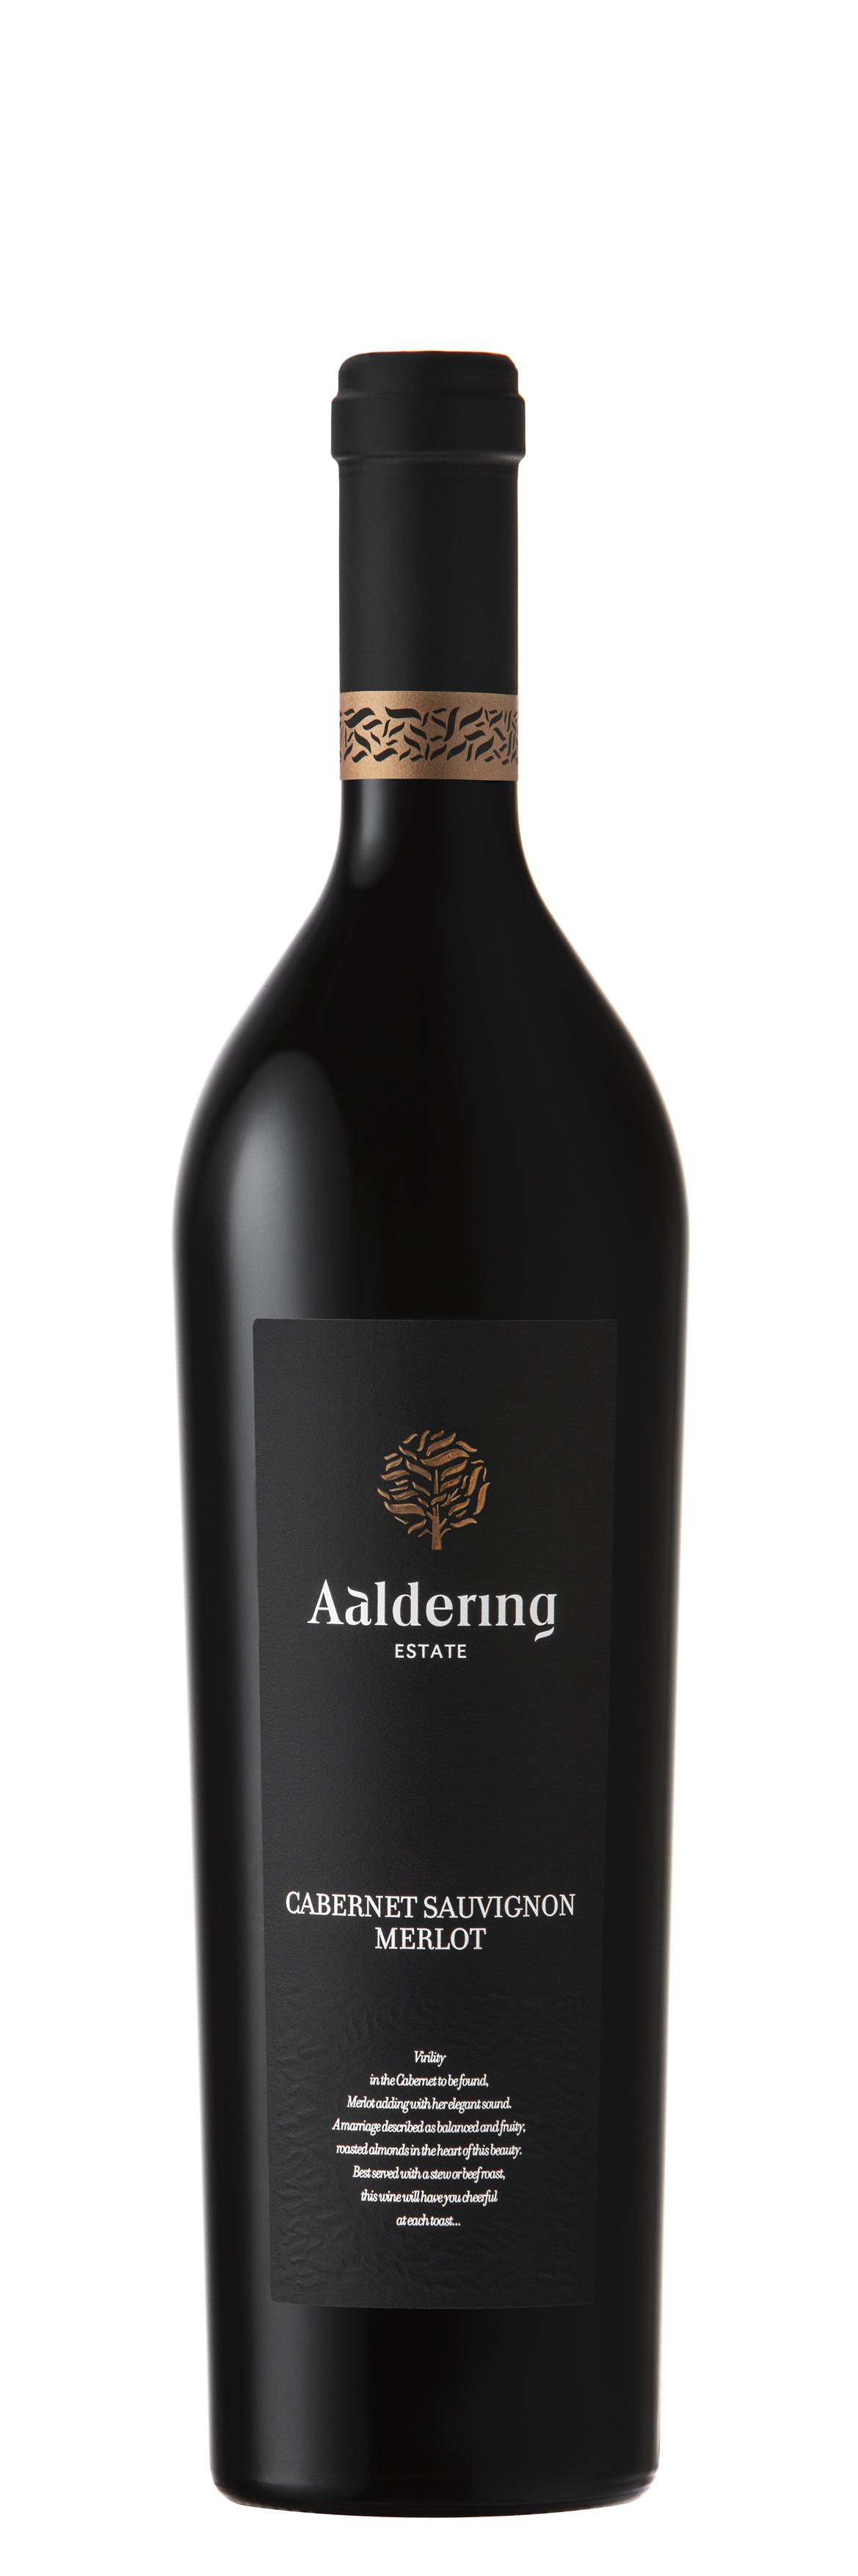 Aaldering Cabernet Sauvignon Merlot 2018